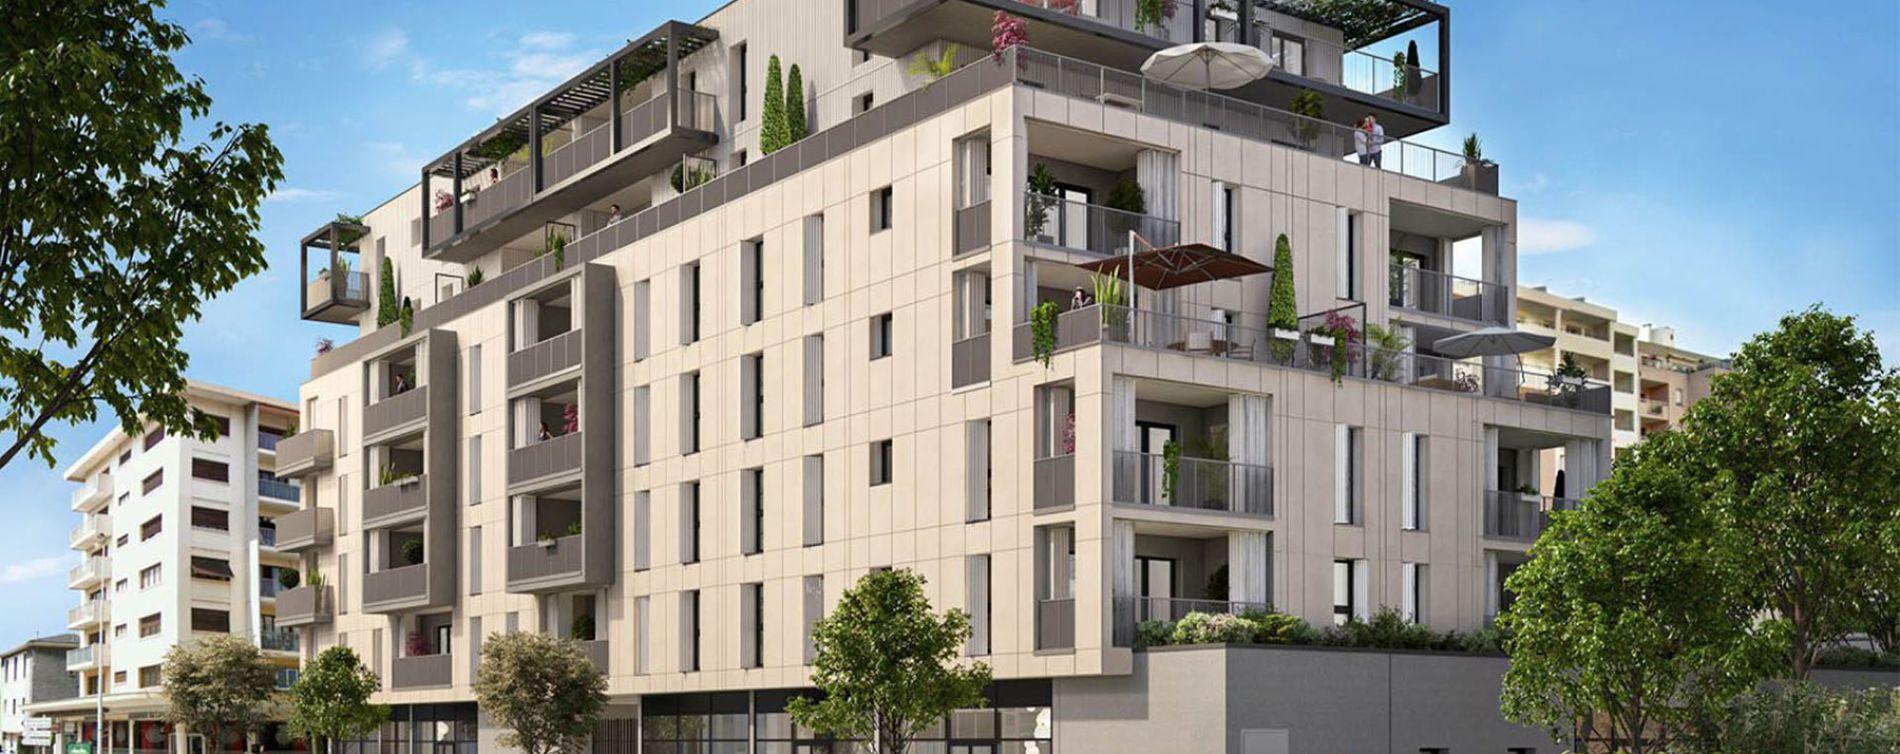 Annemasse : programme immobilier neuve « Résidence Nova » en Loi Pinel